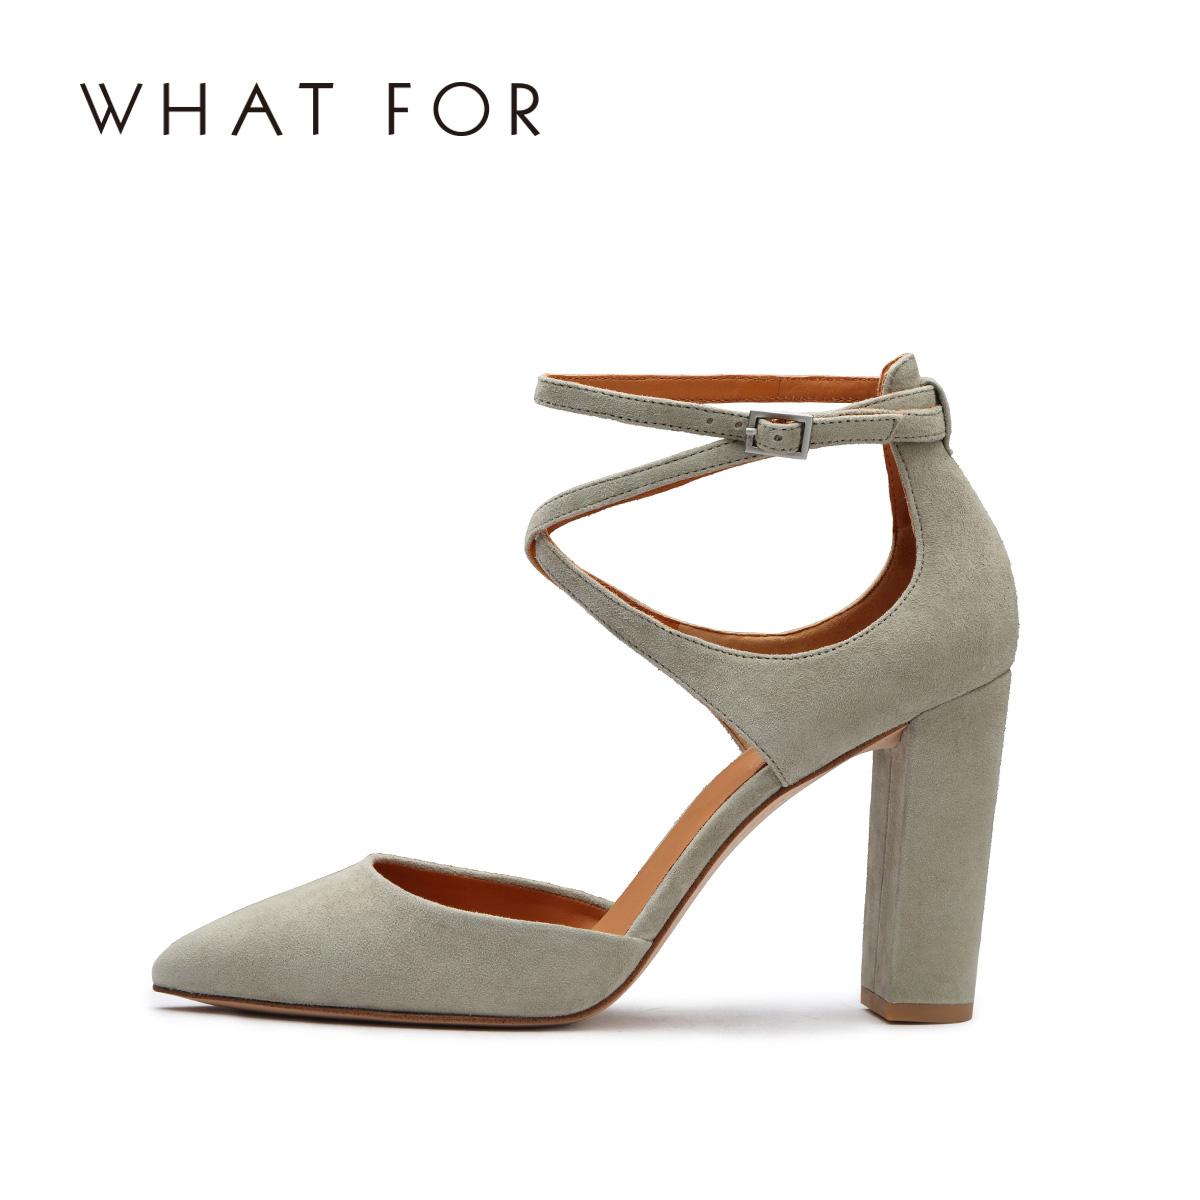 WHAT FOR夏季高跟鞋交叉细带搭扣时尚凉鞋尖头粗跟玛丽珍鞋